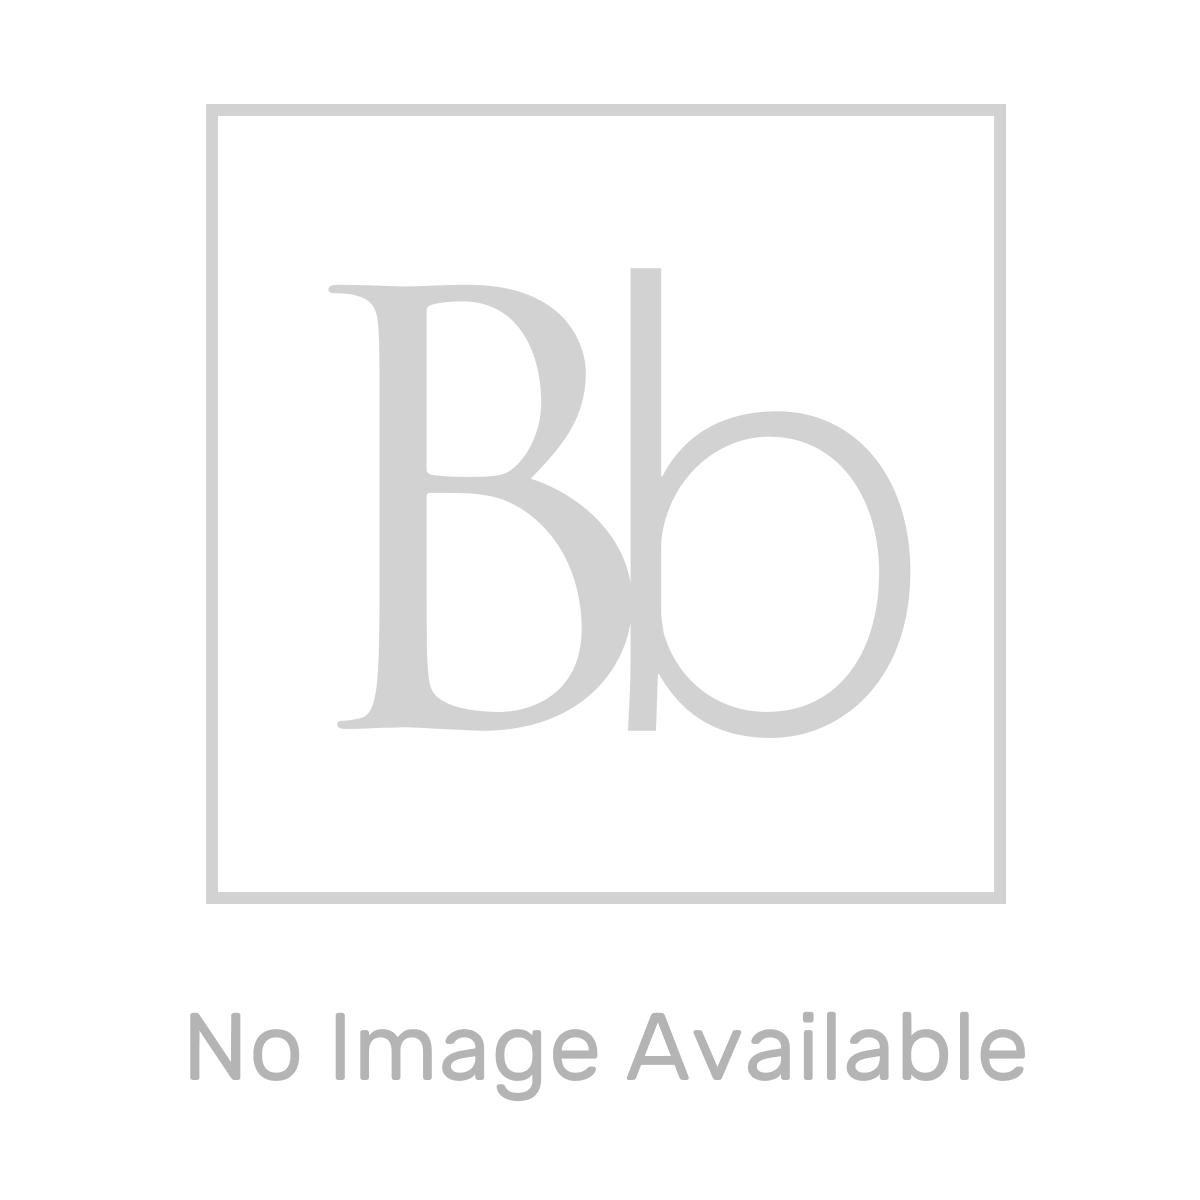 Burlington Balthazar Freestanding Bath with White Outer 1675mm